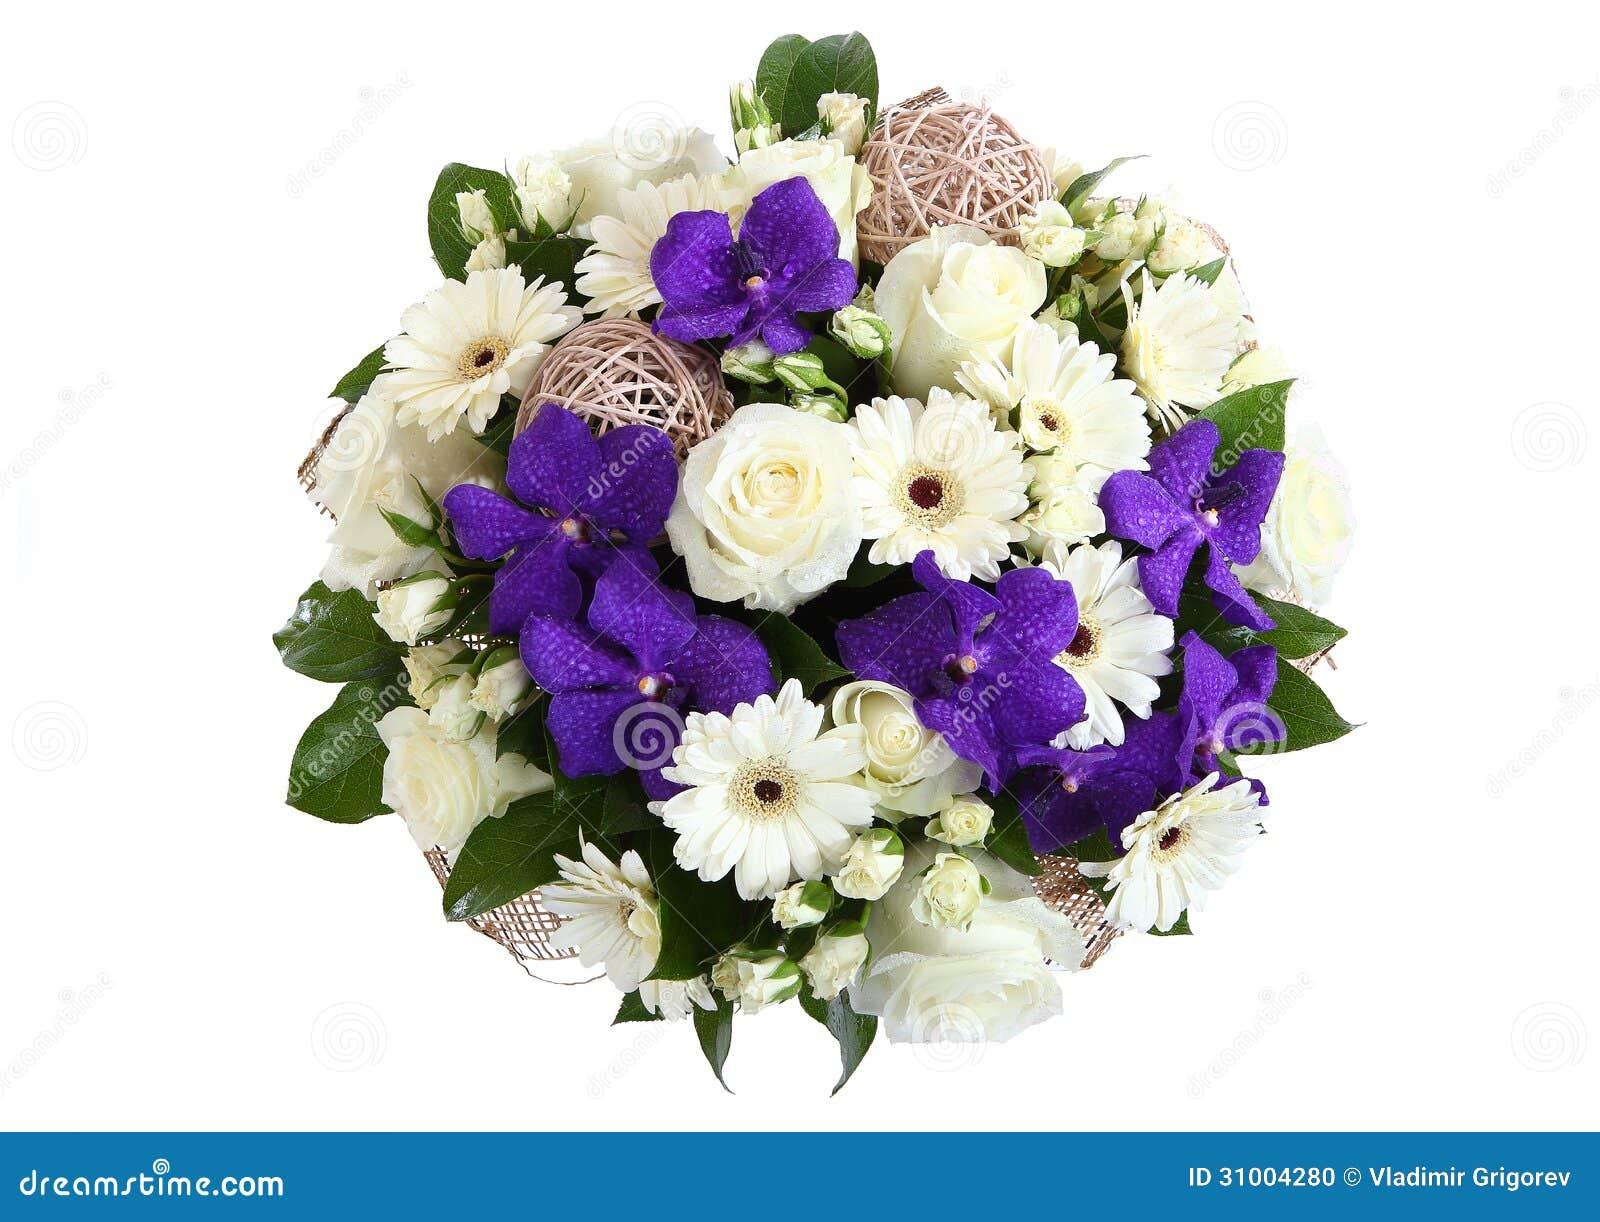 Bouquet of white roses white gerbera daisies and violet orchid download bouquet of white roses white gerbera daisies and violet orchid stock photo mightylinksfo